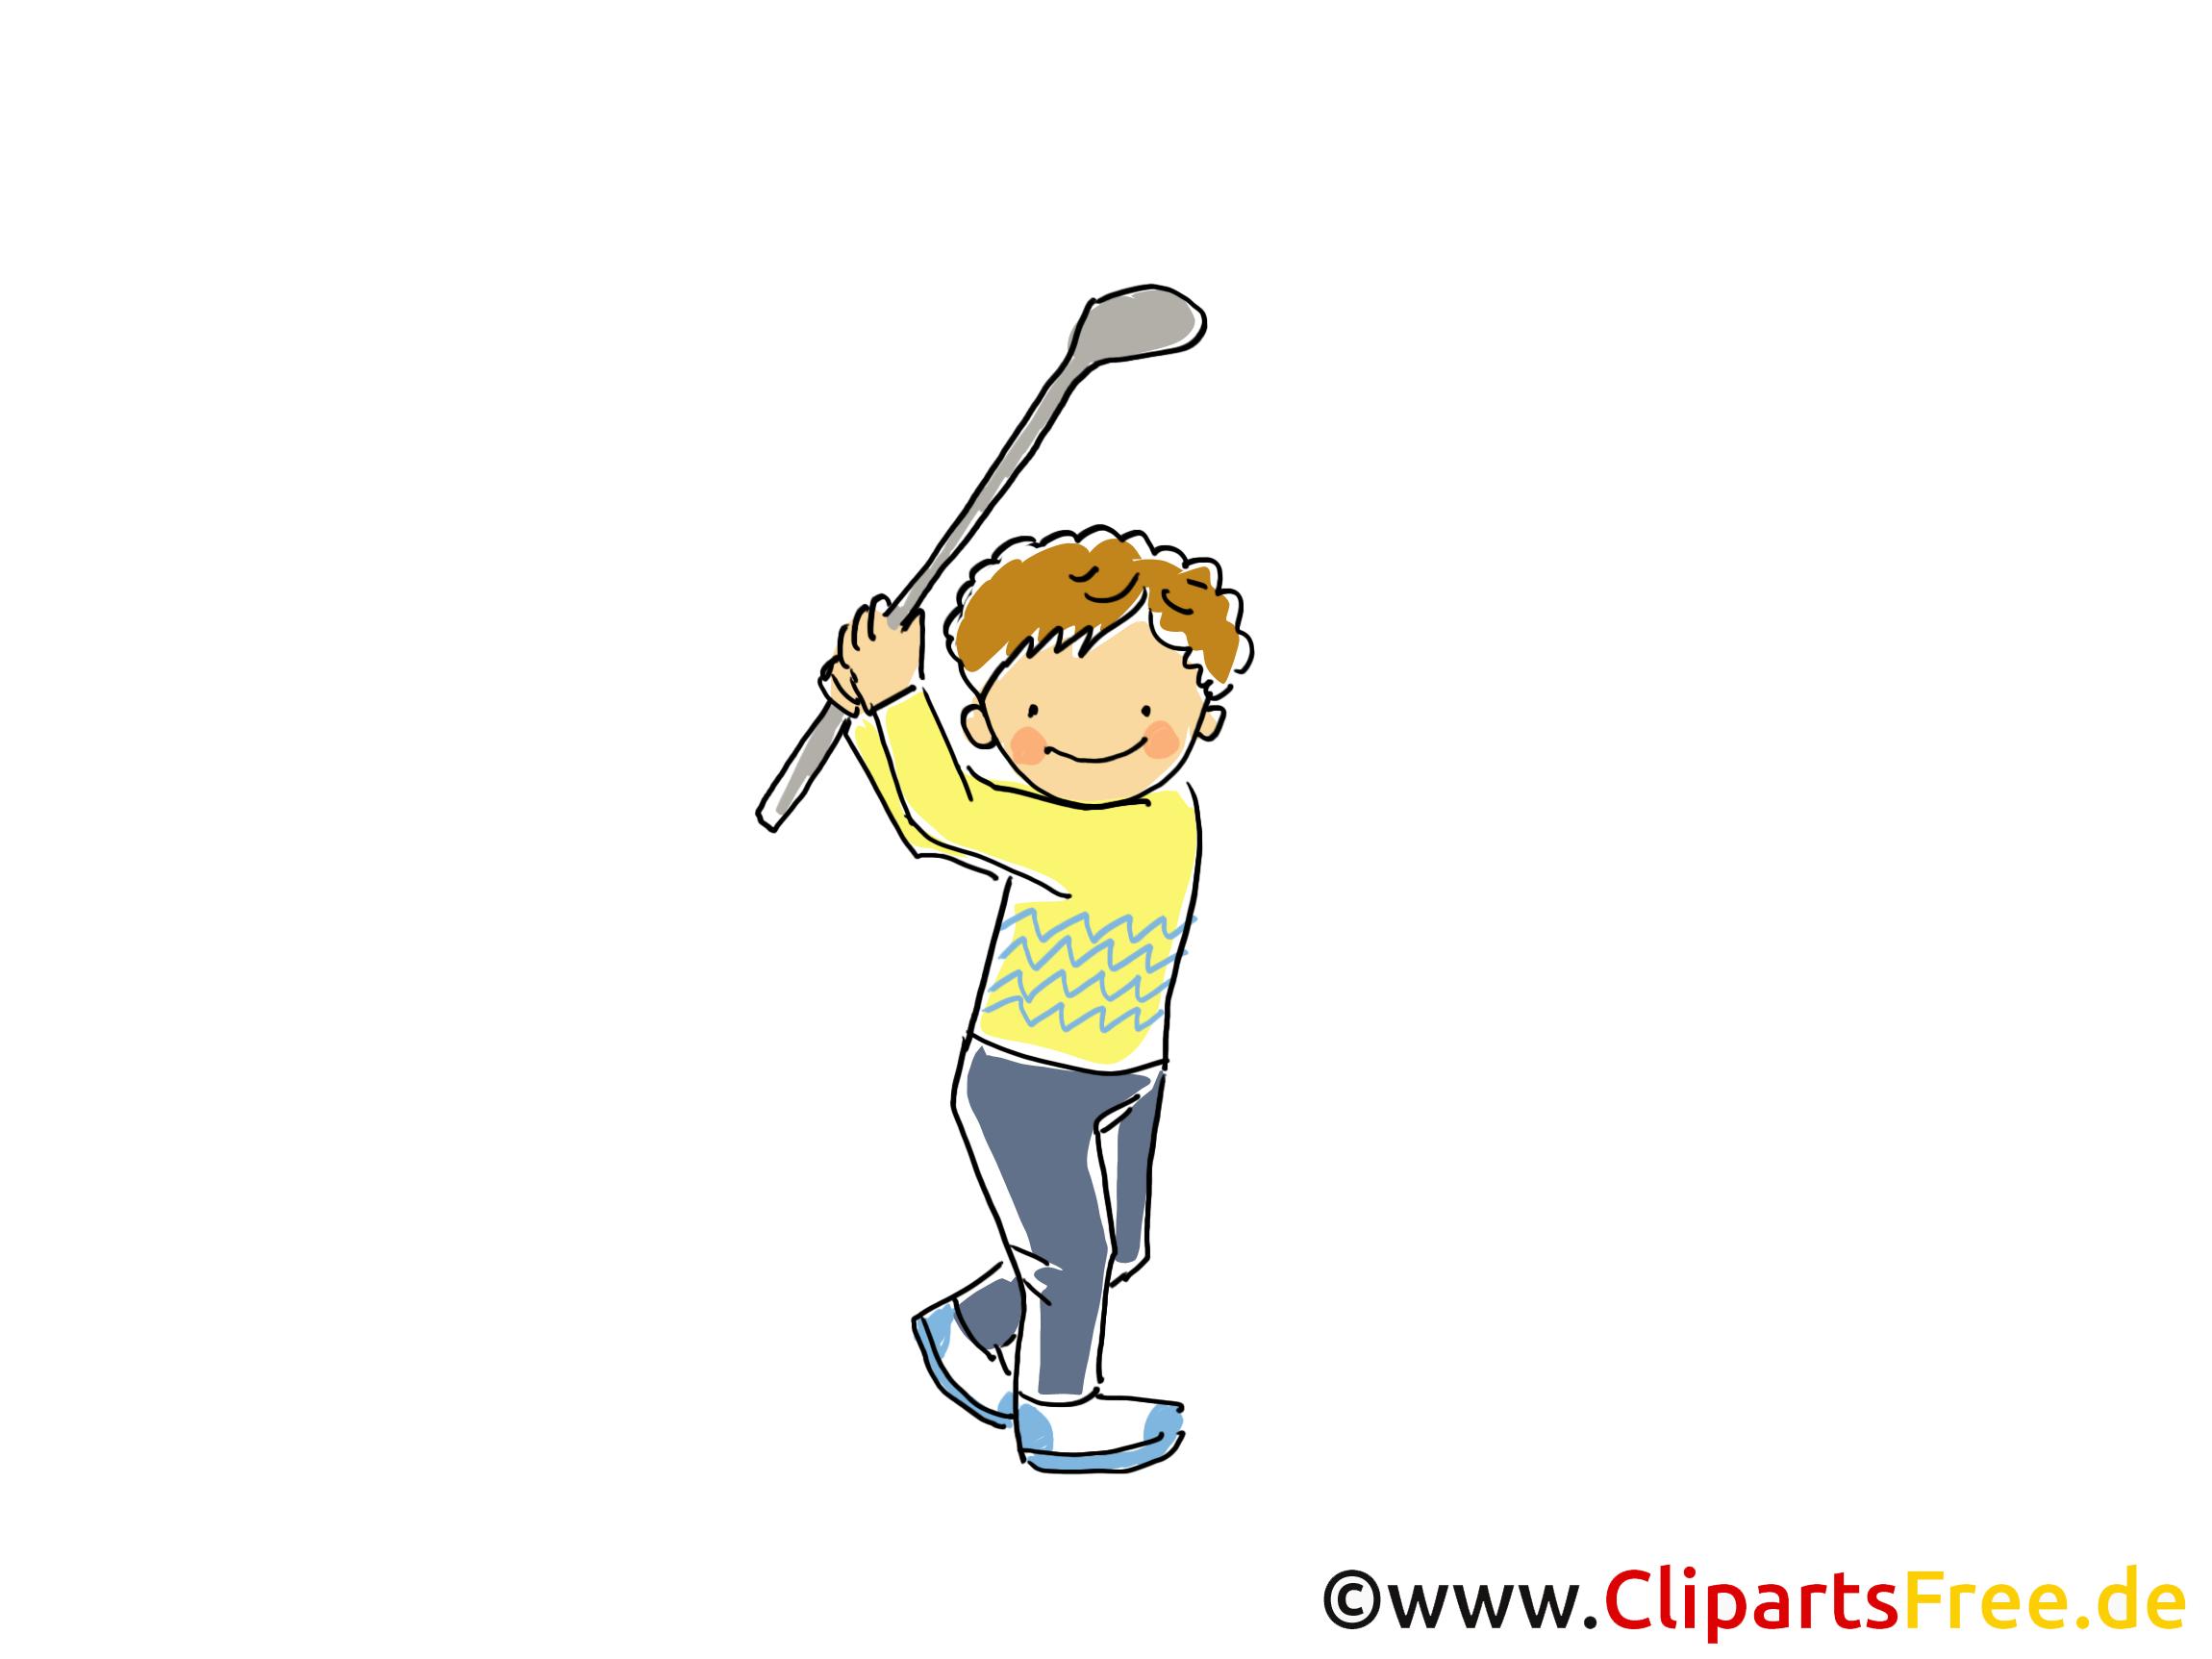 Cricket illustration - Crosse images gratuites